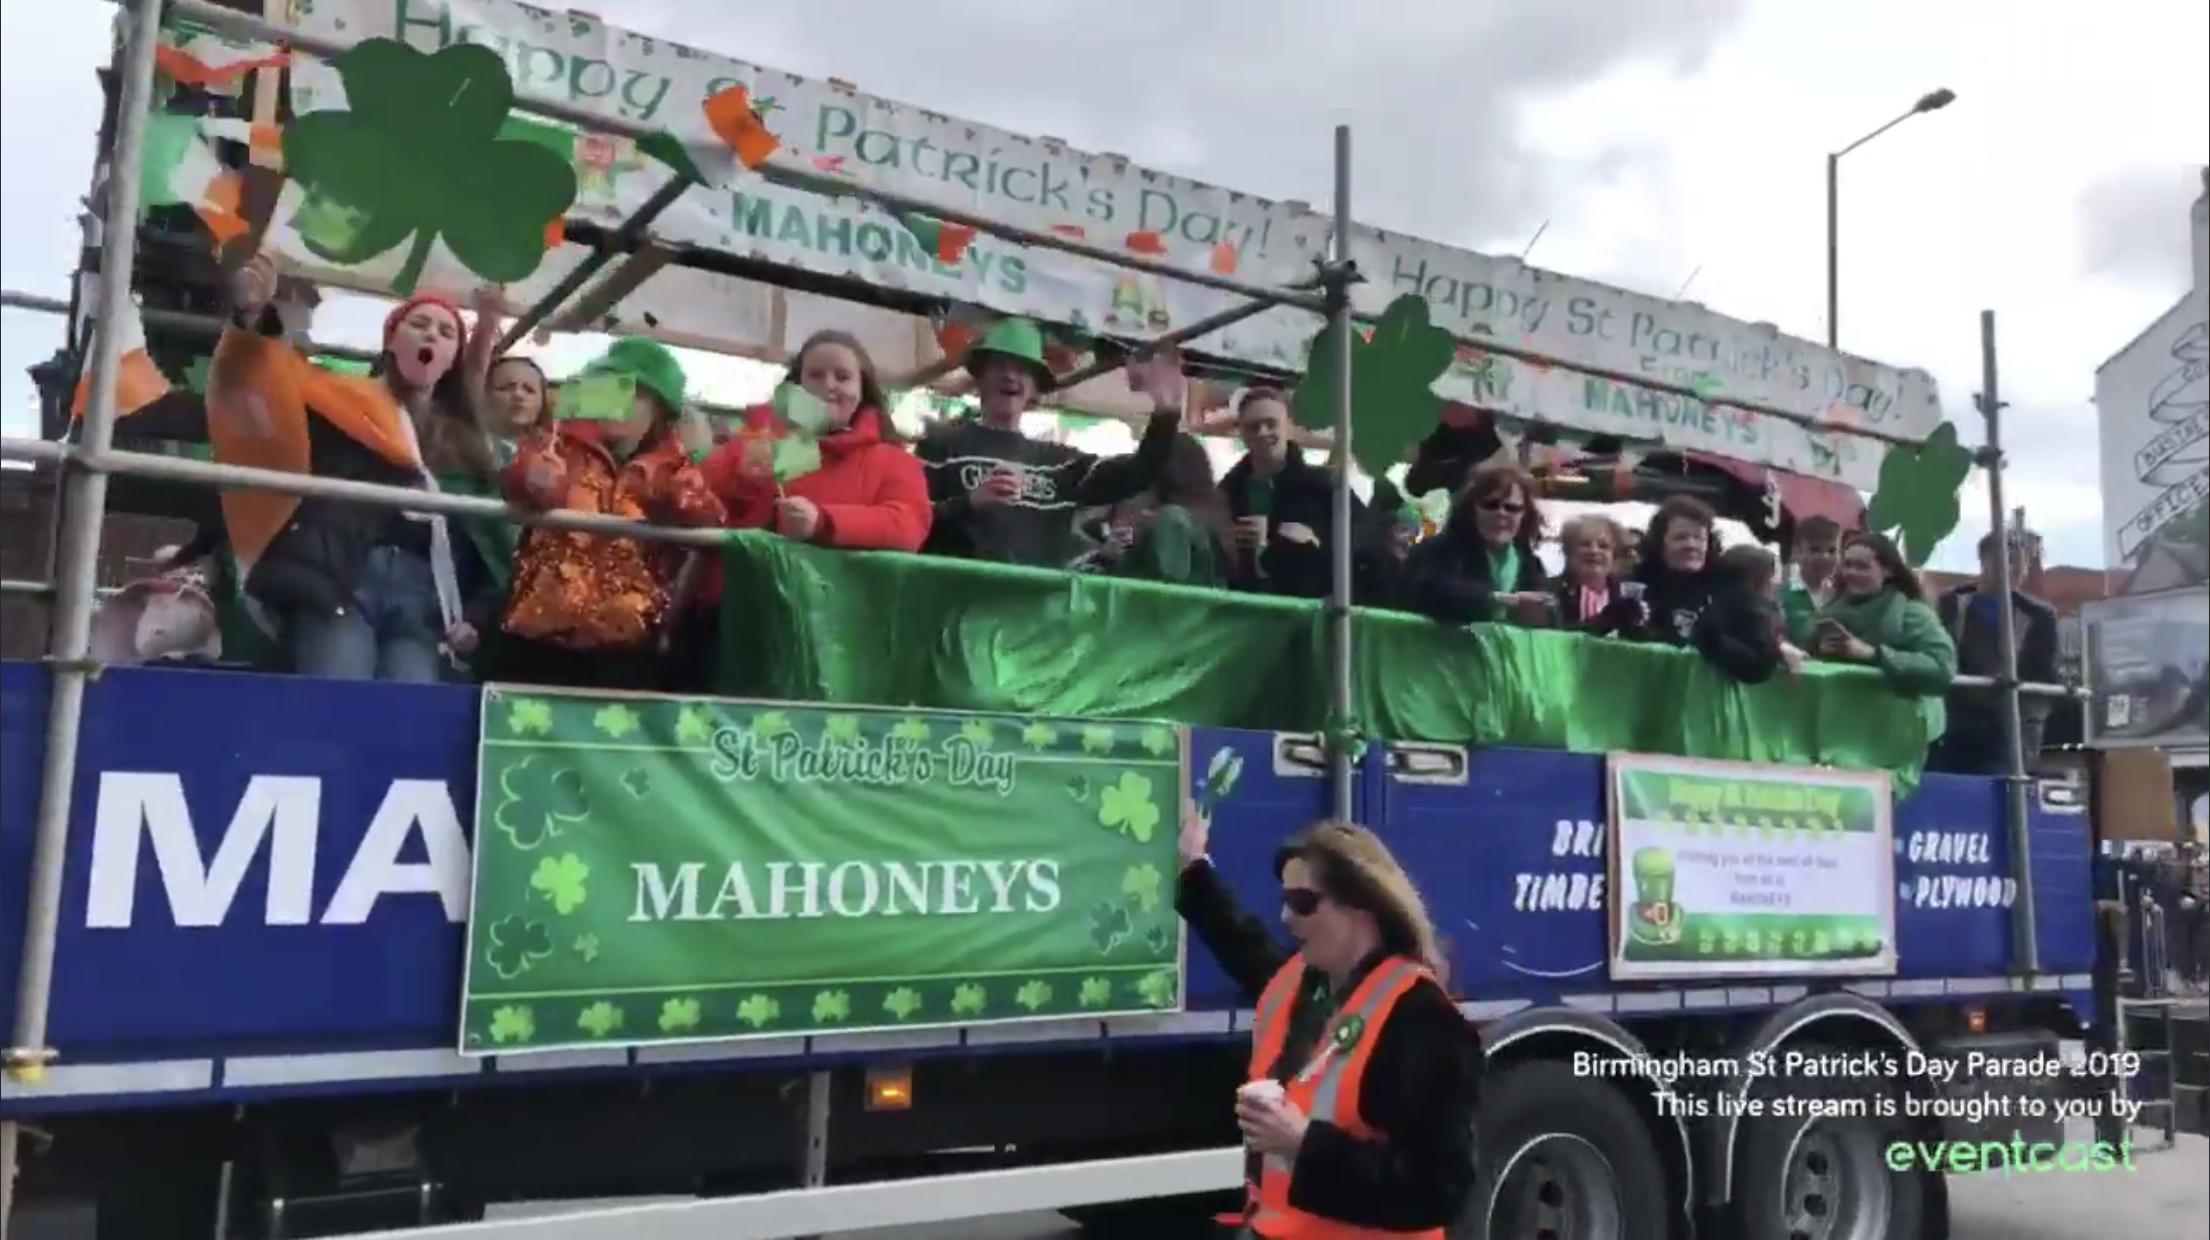 St Patrick's Day Parade 2019